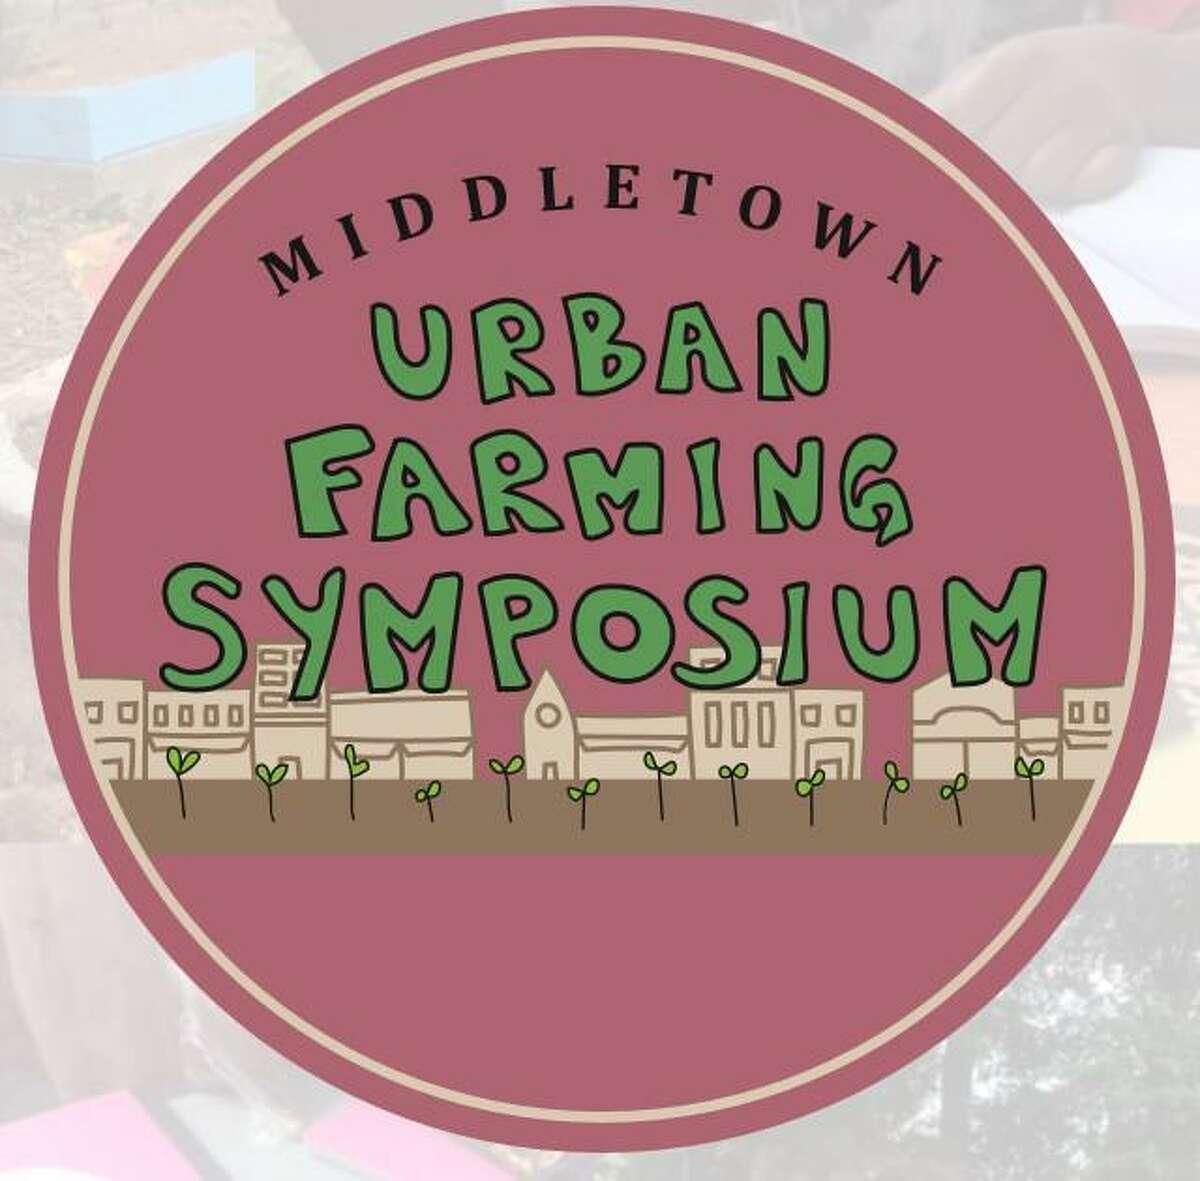 The Middletown Urban Farming Symposium is taking place Oct. 12-13 at Wesleyan University.